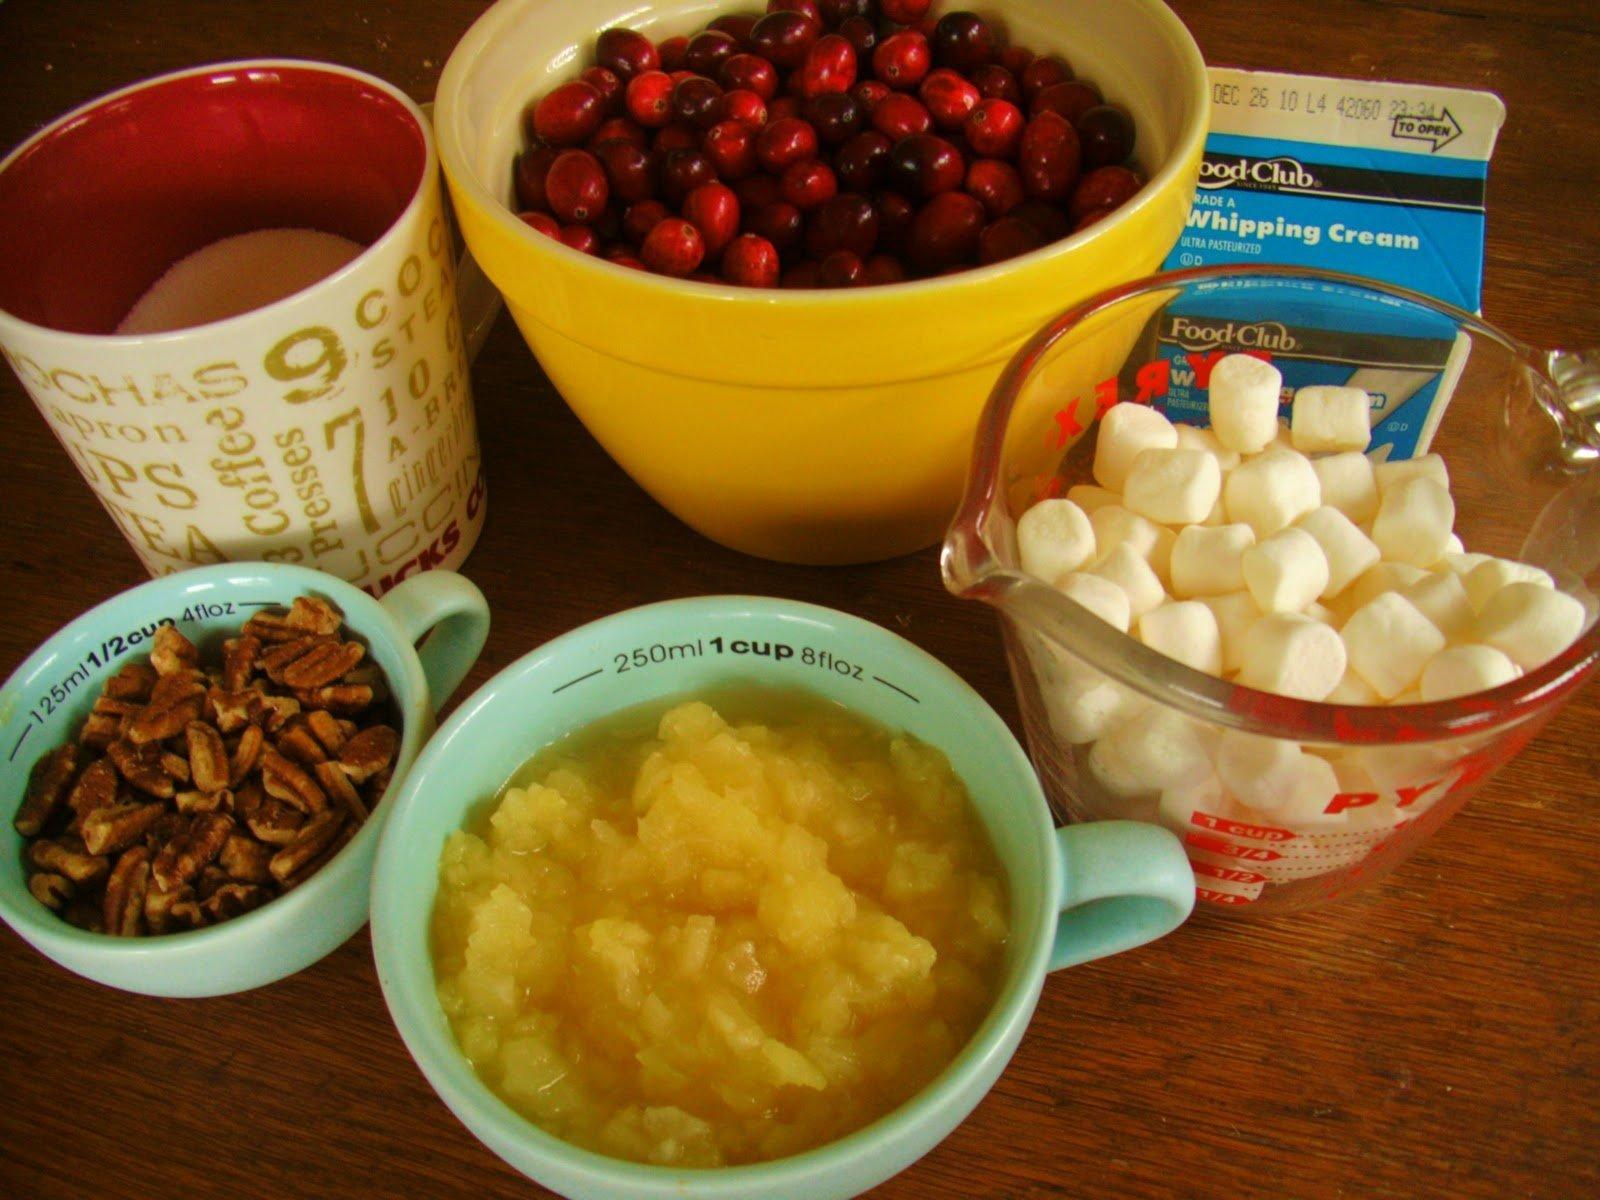 Fresh Cranberry Salad Ingredients